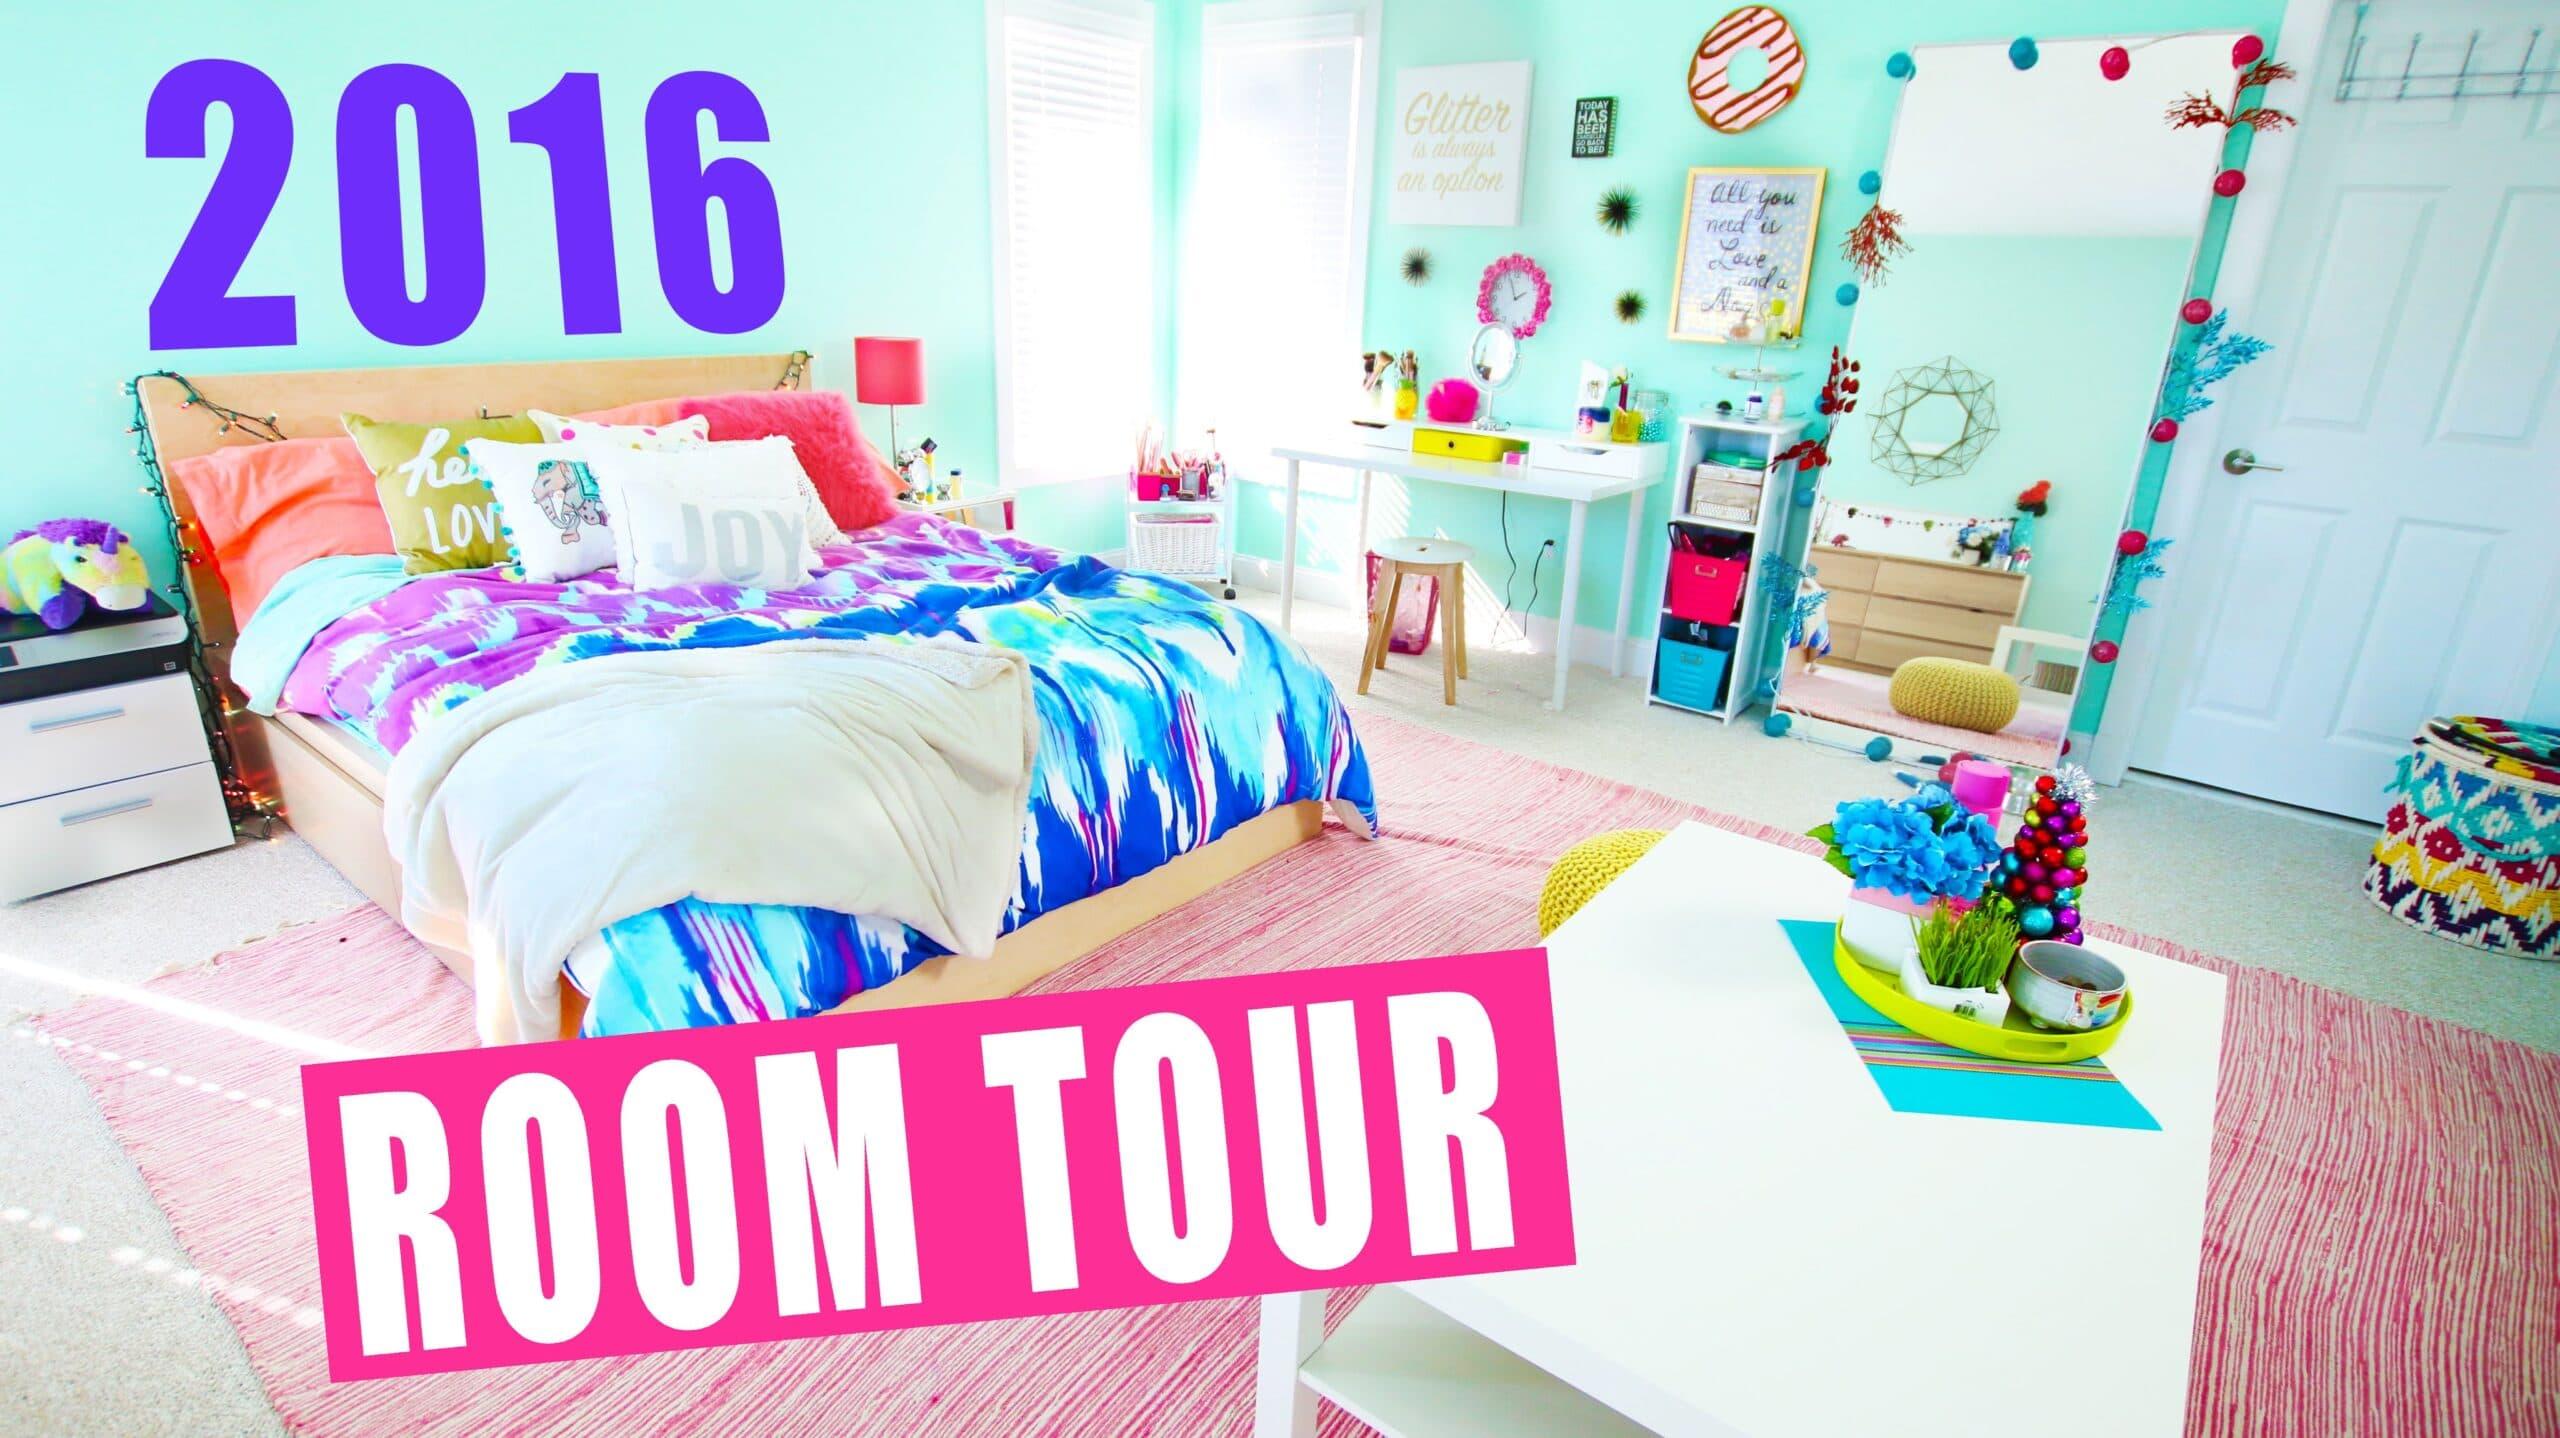 Room Tour 2016!